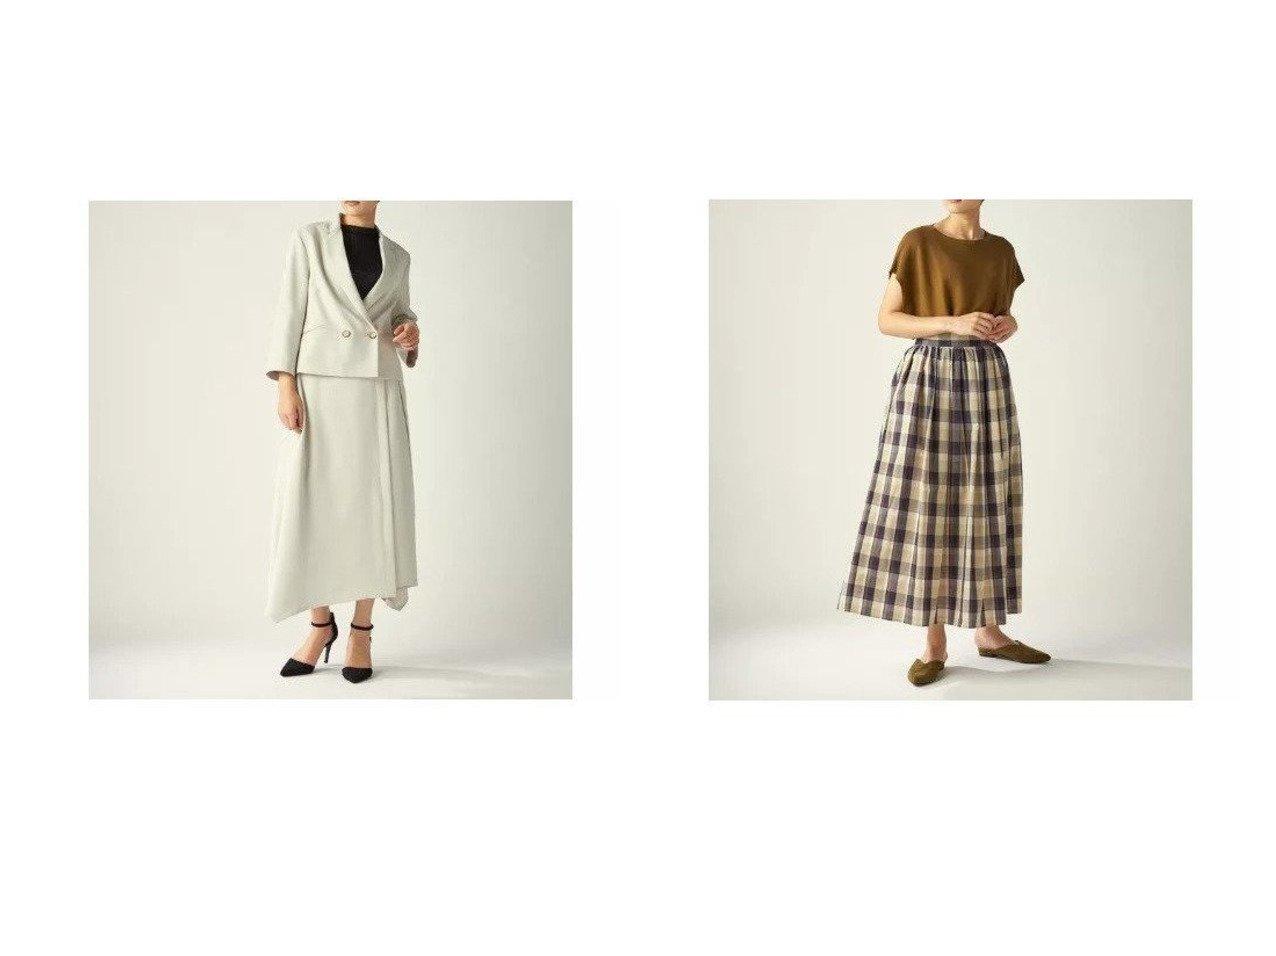 【CLEAR IMPRESSION/クリアインプレッション】のエステルオックススカート&エステルコットンチェックスカート 【スカート】おすすめ!人気、トレンド・レディースファッションの通販 おすすめで人気の流行・トレンド、ファッションの通販商品 メンズファッション・キッズファッション・インテリア・家具・レディースファッション・服の通販 founy(ファニー) https://founy.com/ ファッション Fashion レディースファッション WOMEN スカート Skirt シンプル ジャケット セットアップ ポケット ラップ ギャザー チェック ワイド |ID:crp329100000031412